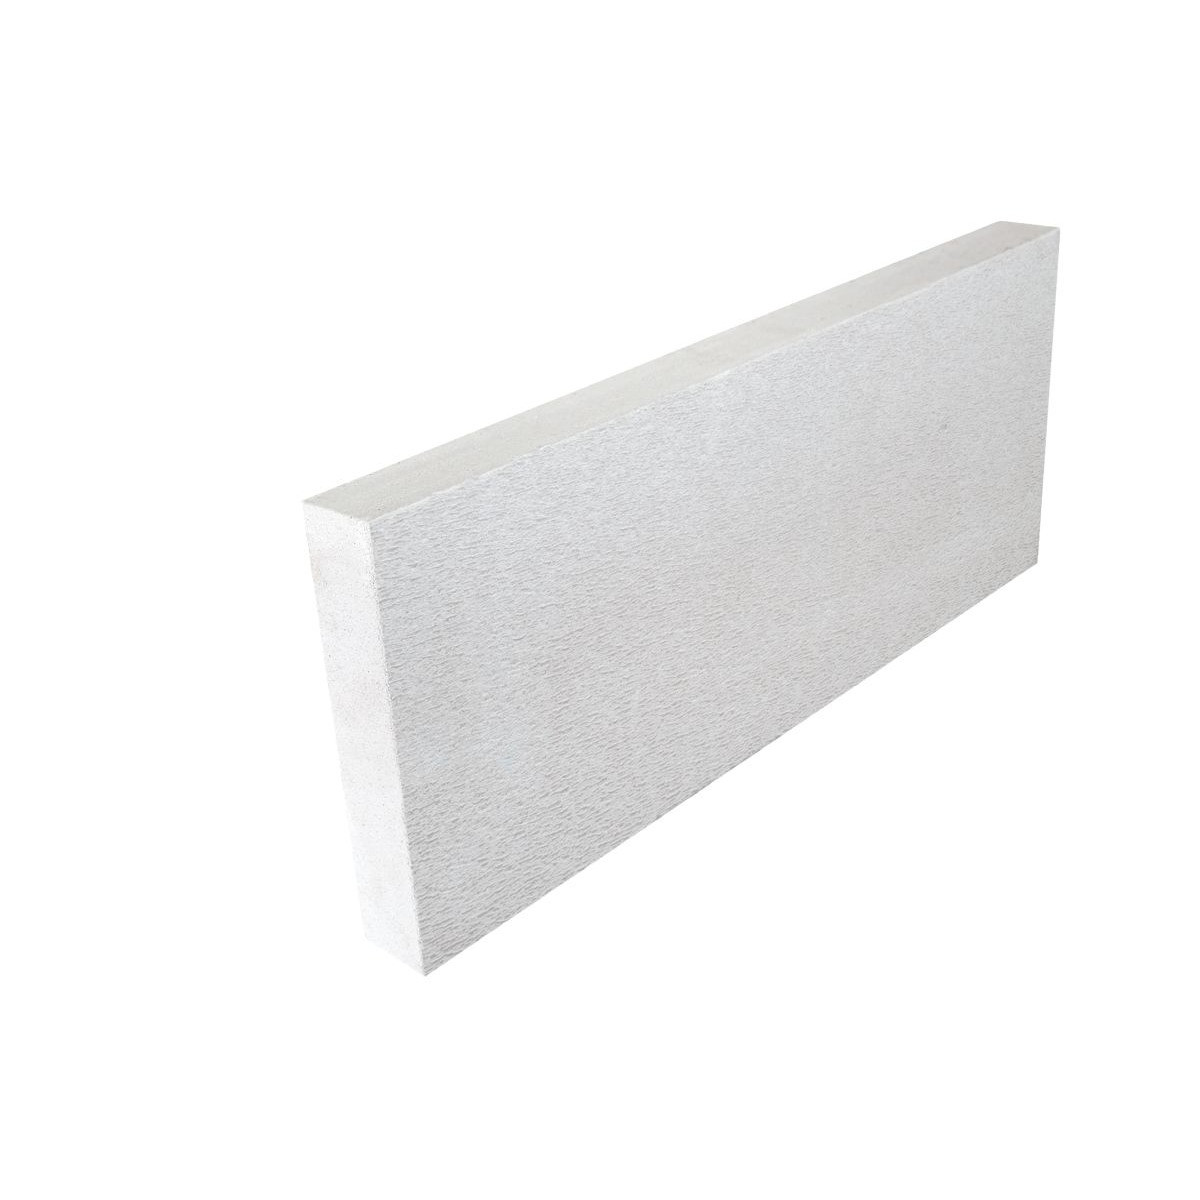 'Блок из ячеист.бетона Бонолит 600х250х50 мм  (поддон-144шт., куб. м. -133 шт.) 3,8кг.